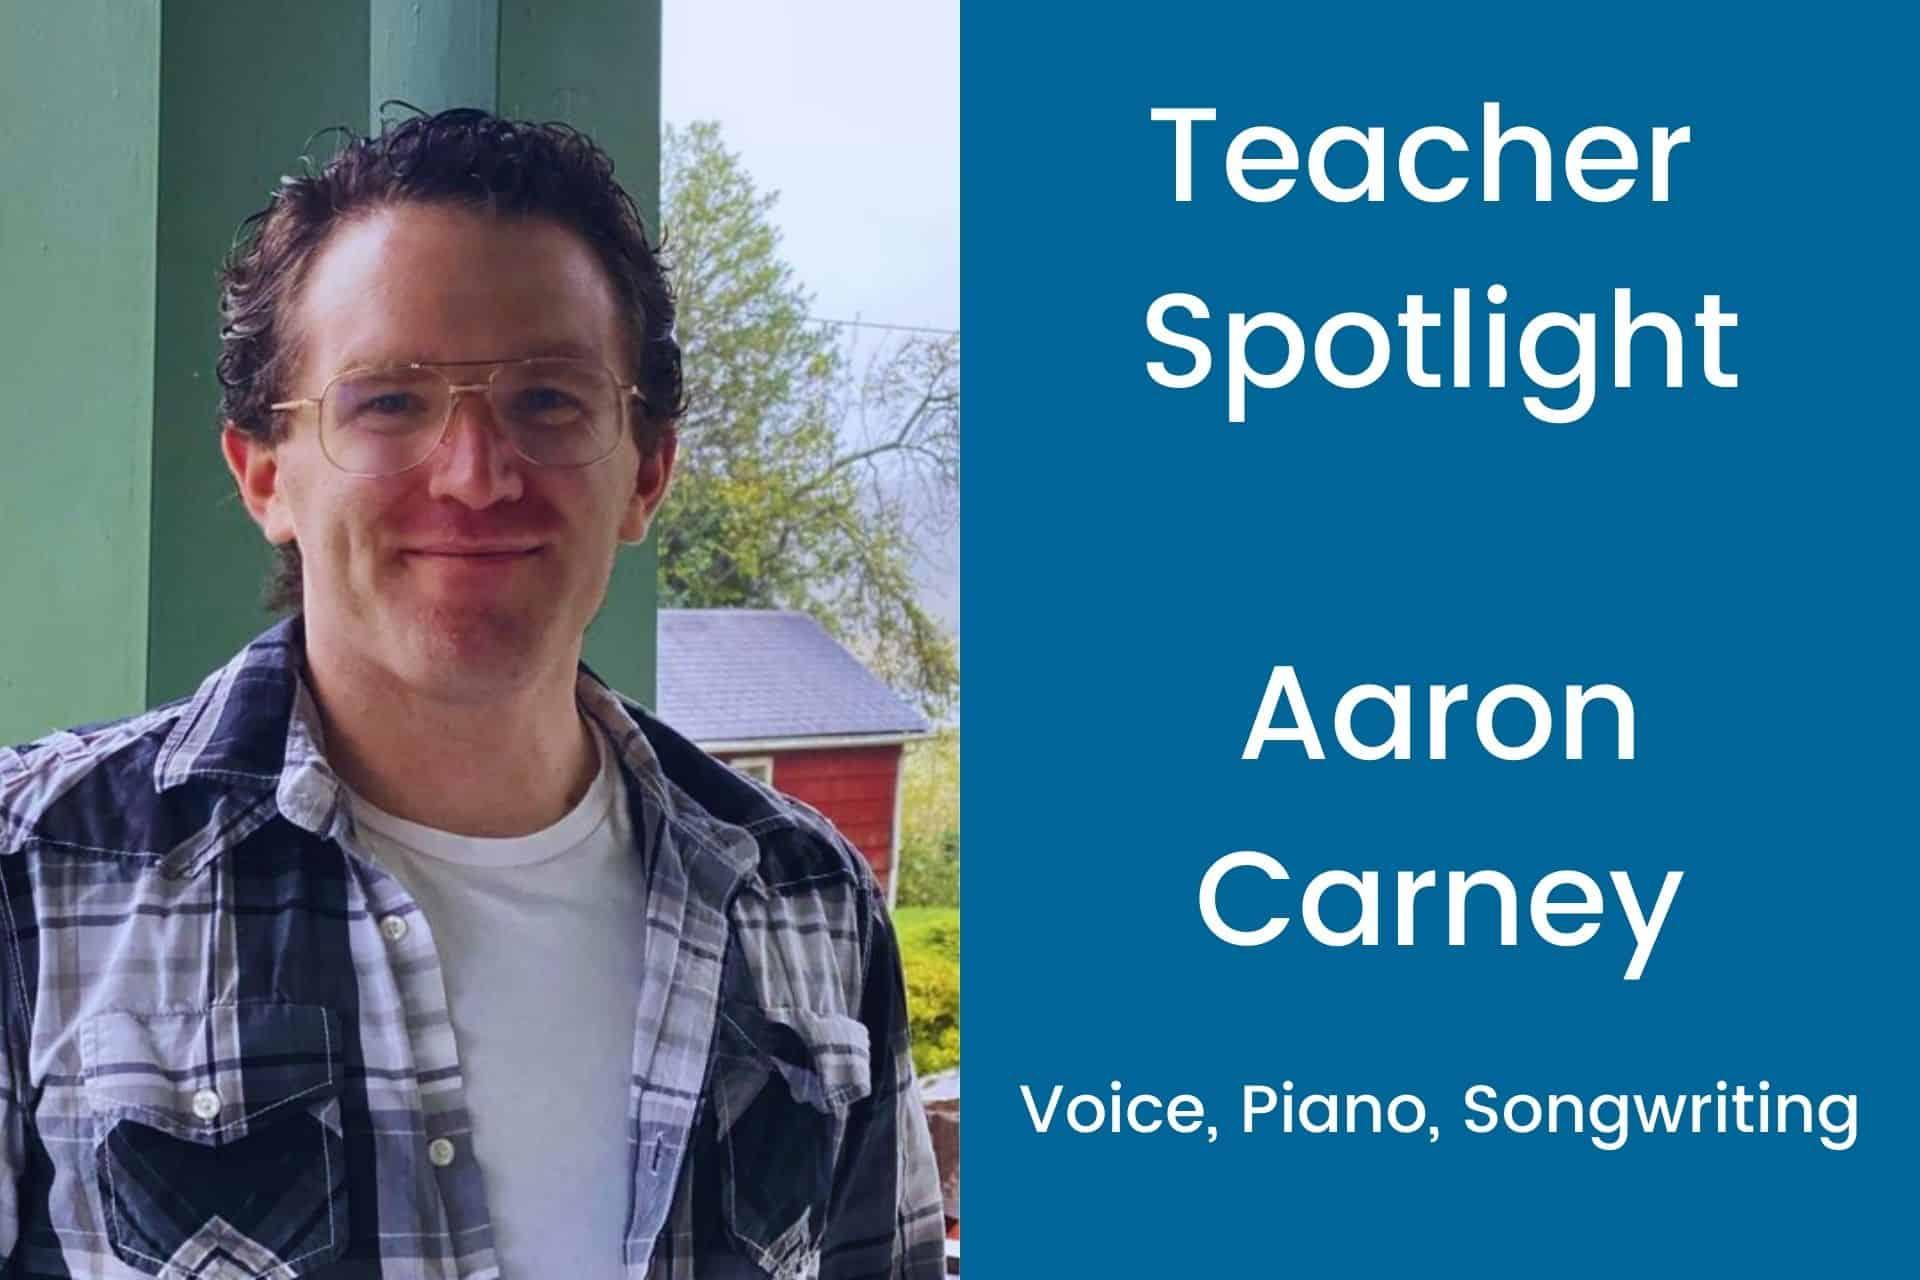 Teacher Spotlight Aaron Carney Voice Piano Songwriting